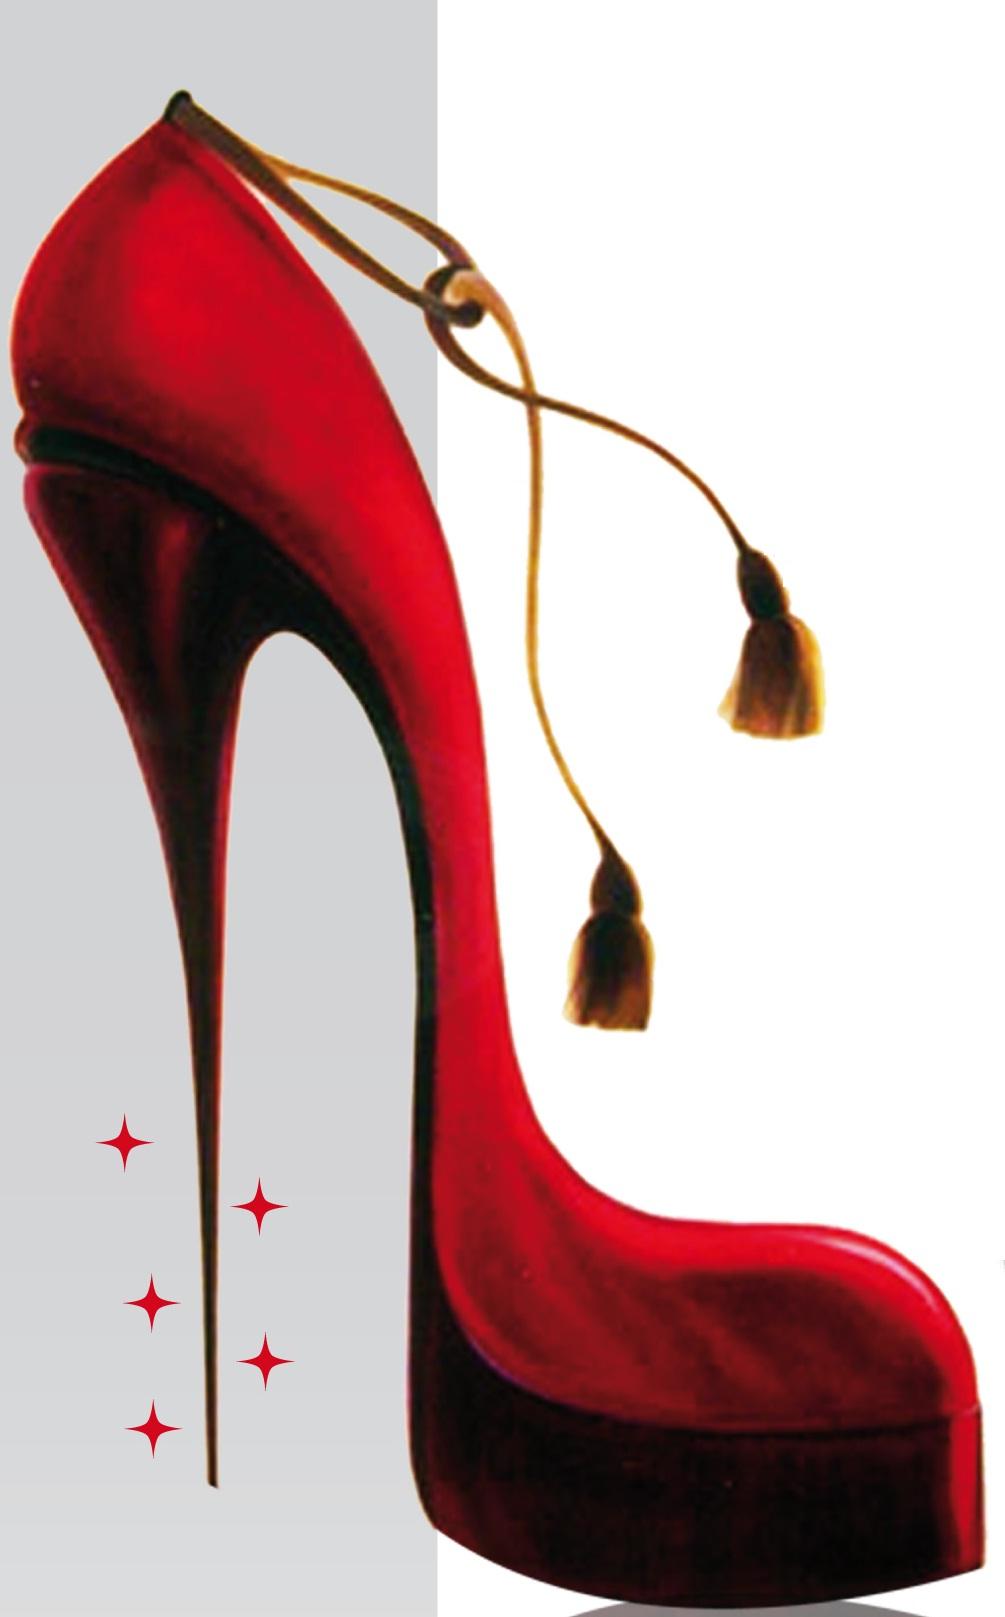 Fichier:Chaussure.jpg — Wikipédia